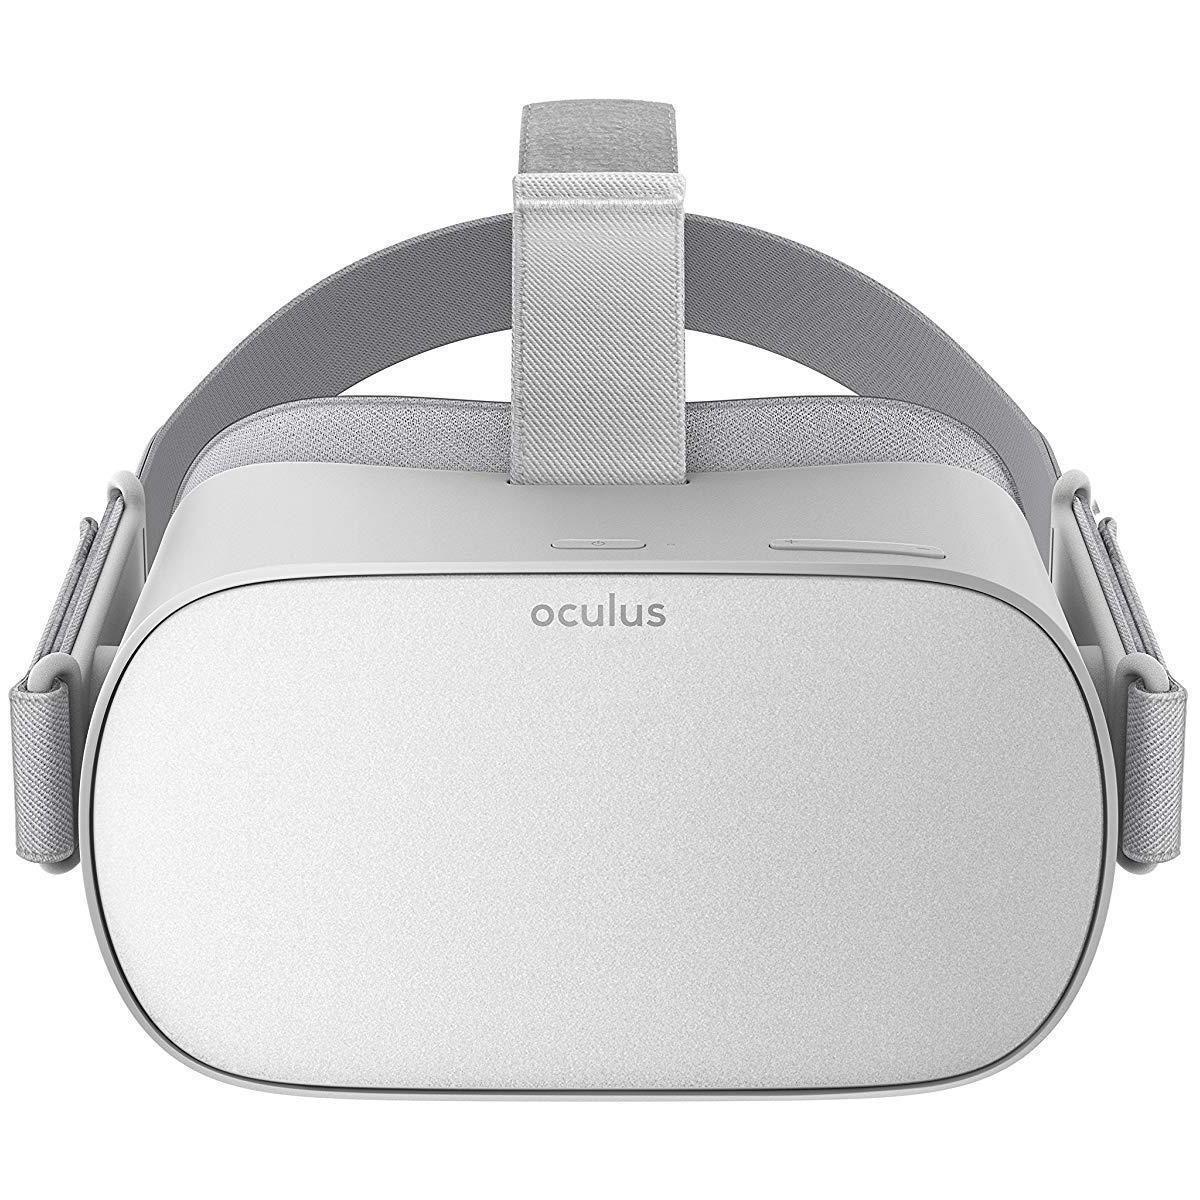 Casque de r�alit� virtuelle oculus go 32gb - livraison offerte : code relay (photo)